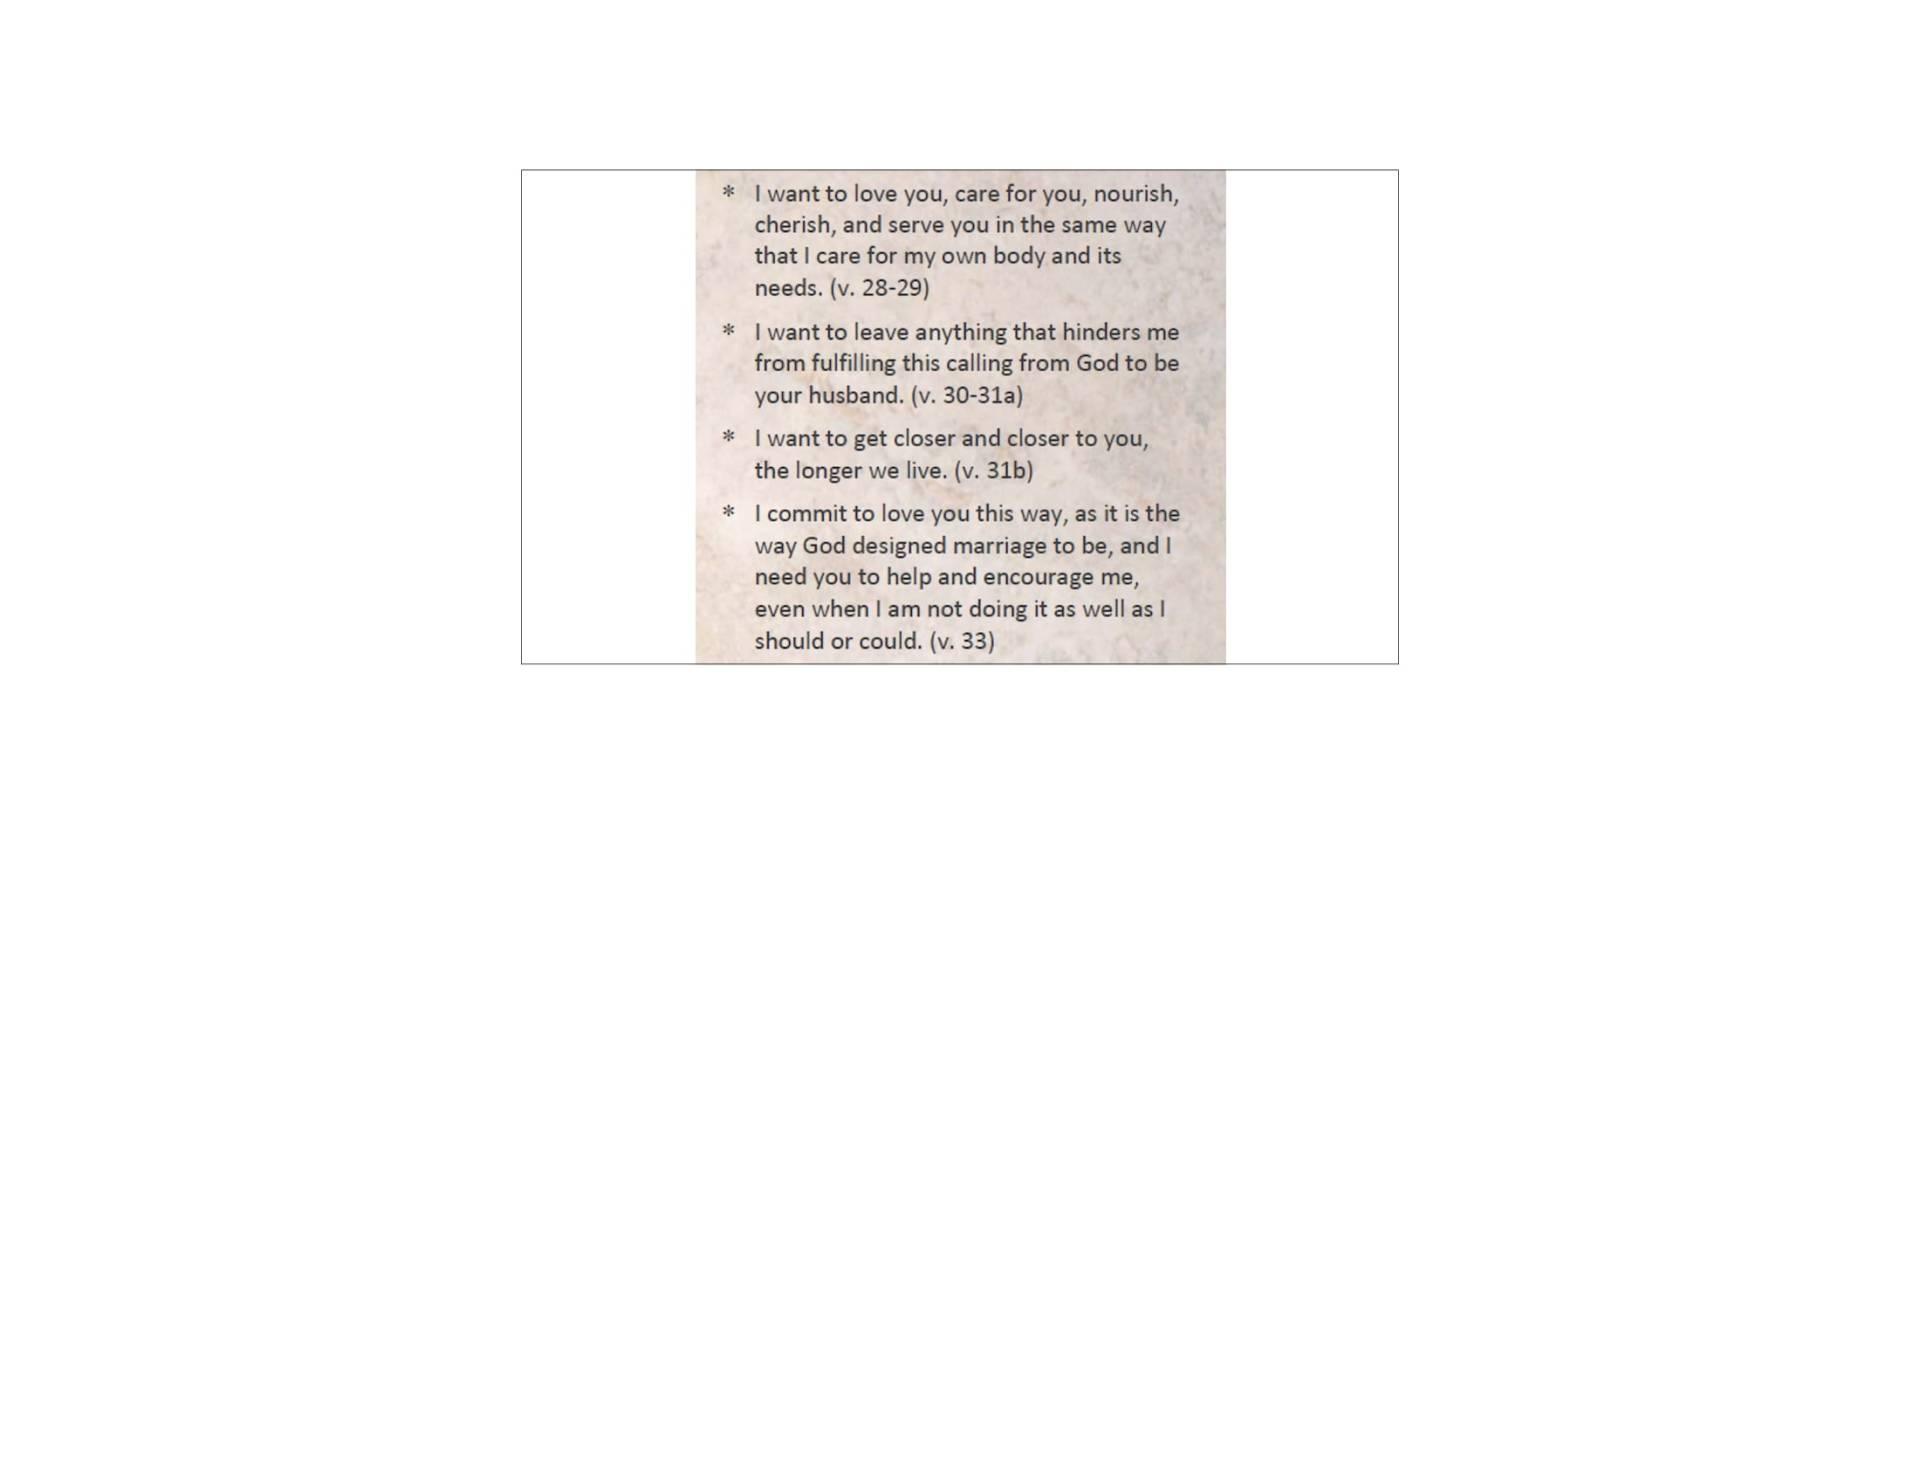 LGI-04 - Caution Men - Spiritual Maturity Is Not Automatic-24